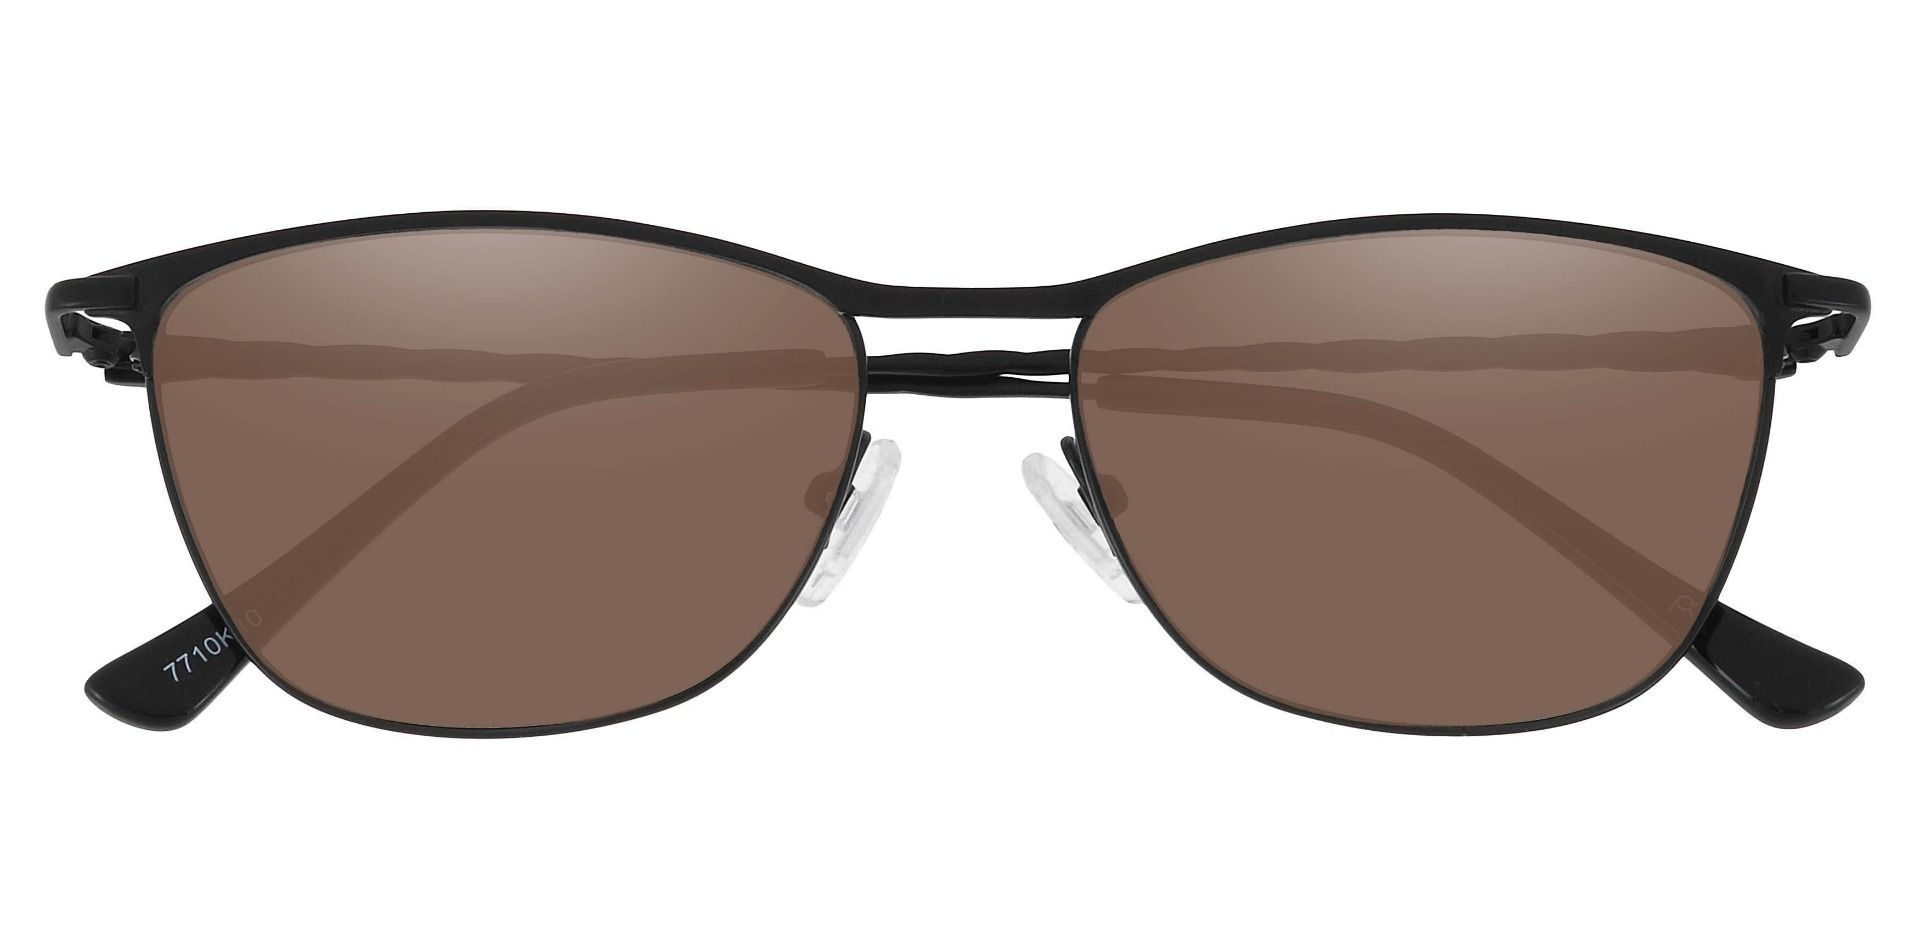 Andrea Cat Eye Prescription Sunglasses - Black Frame With Brown Lenses